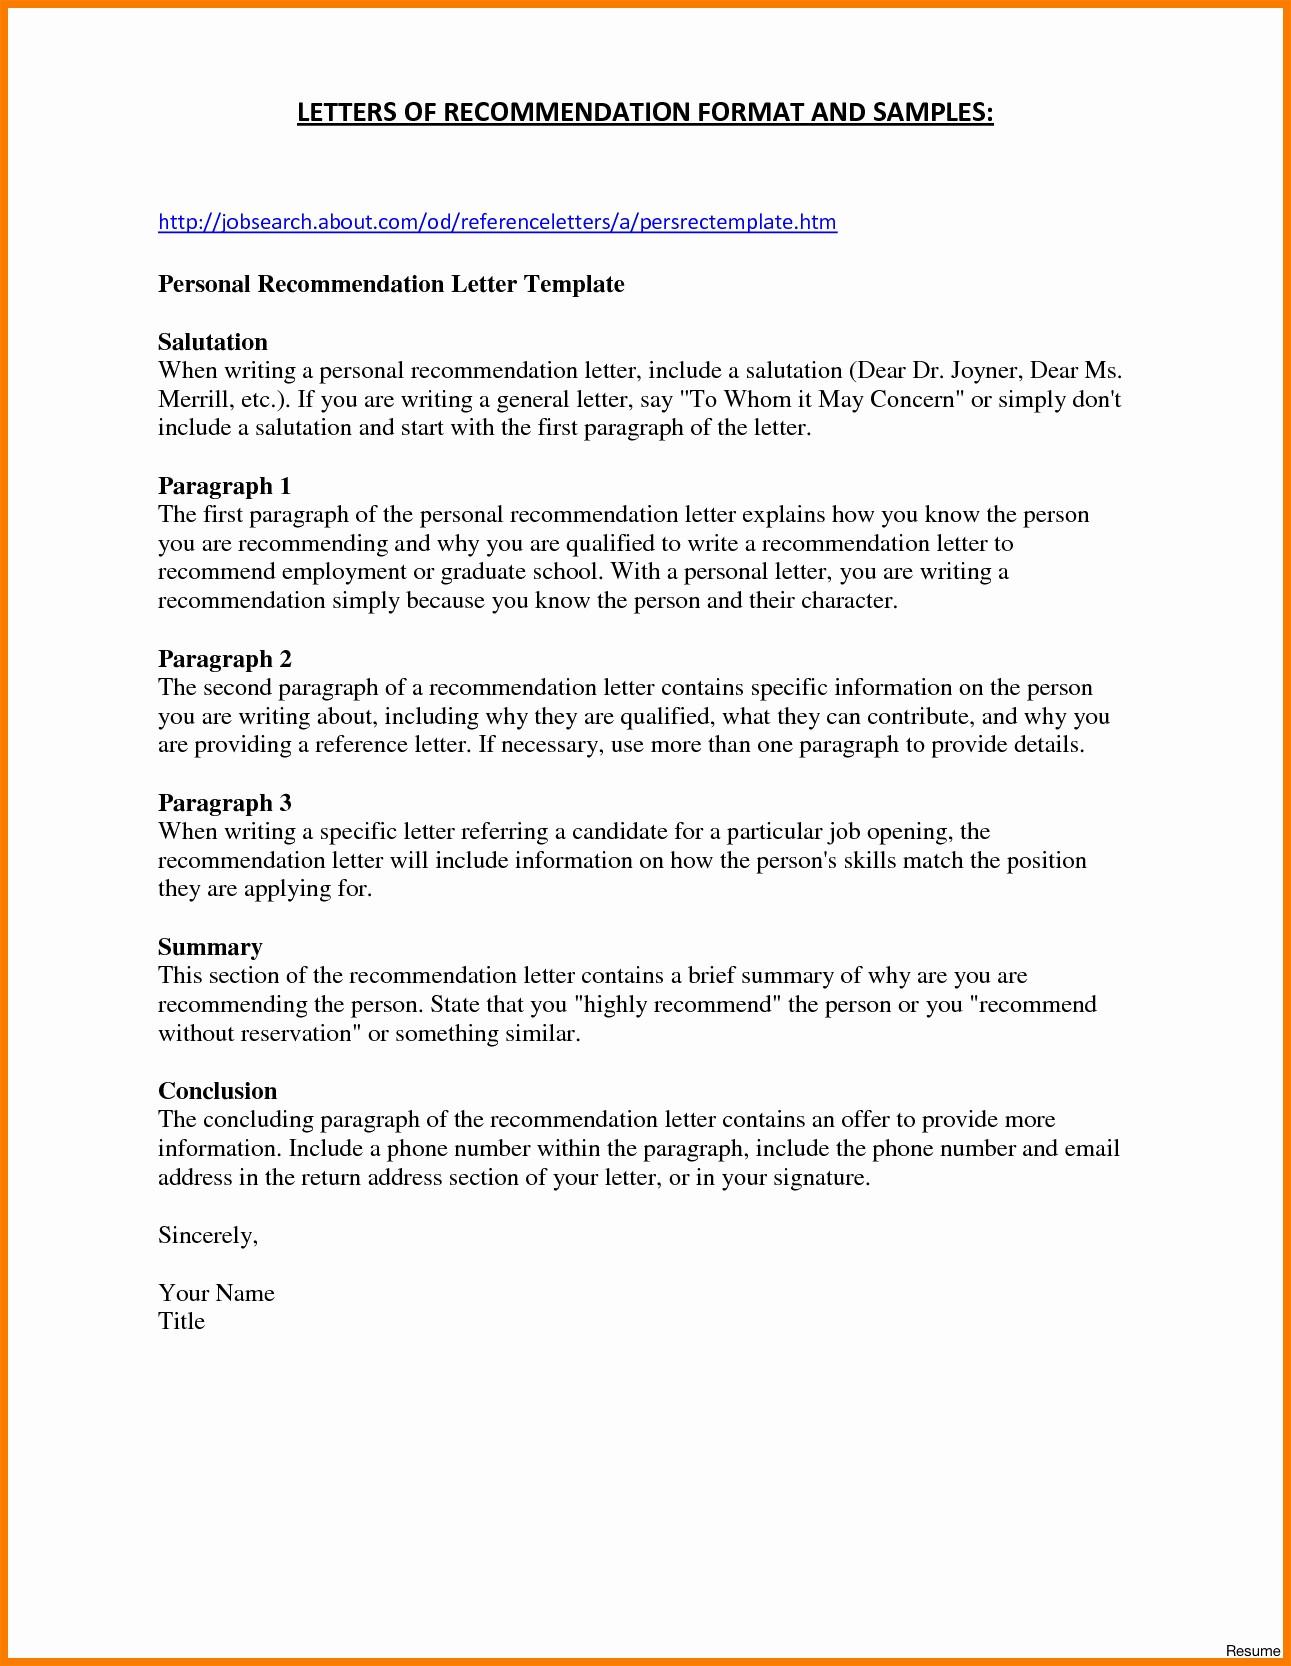 Open Enrollment Template Letter - Sample Open Enrollment Letter to Employees New Beautiful Business